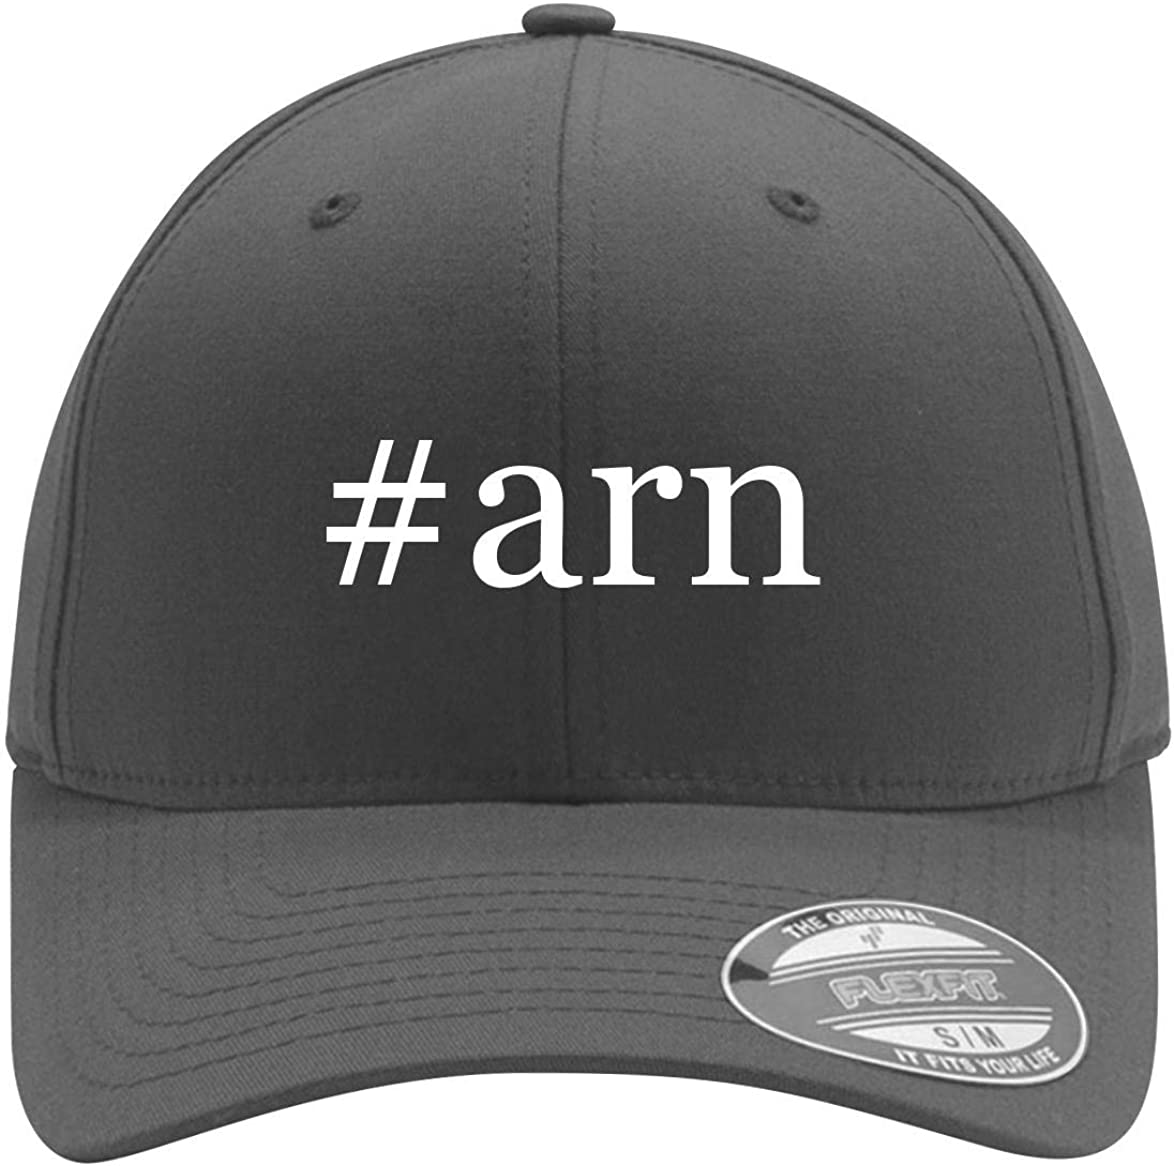 #Arn - Adult Men'S Hashtag Flexfit Baseball Hut Cap